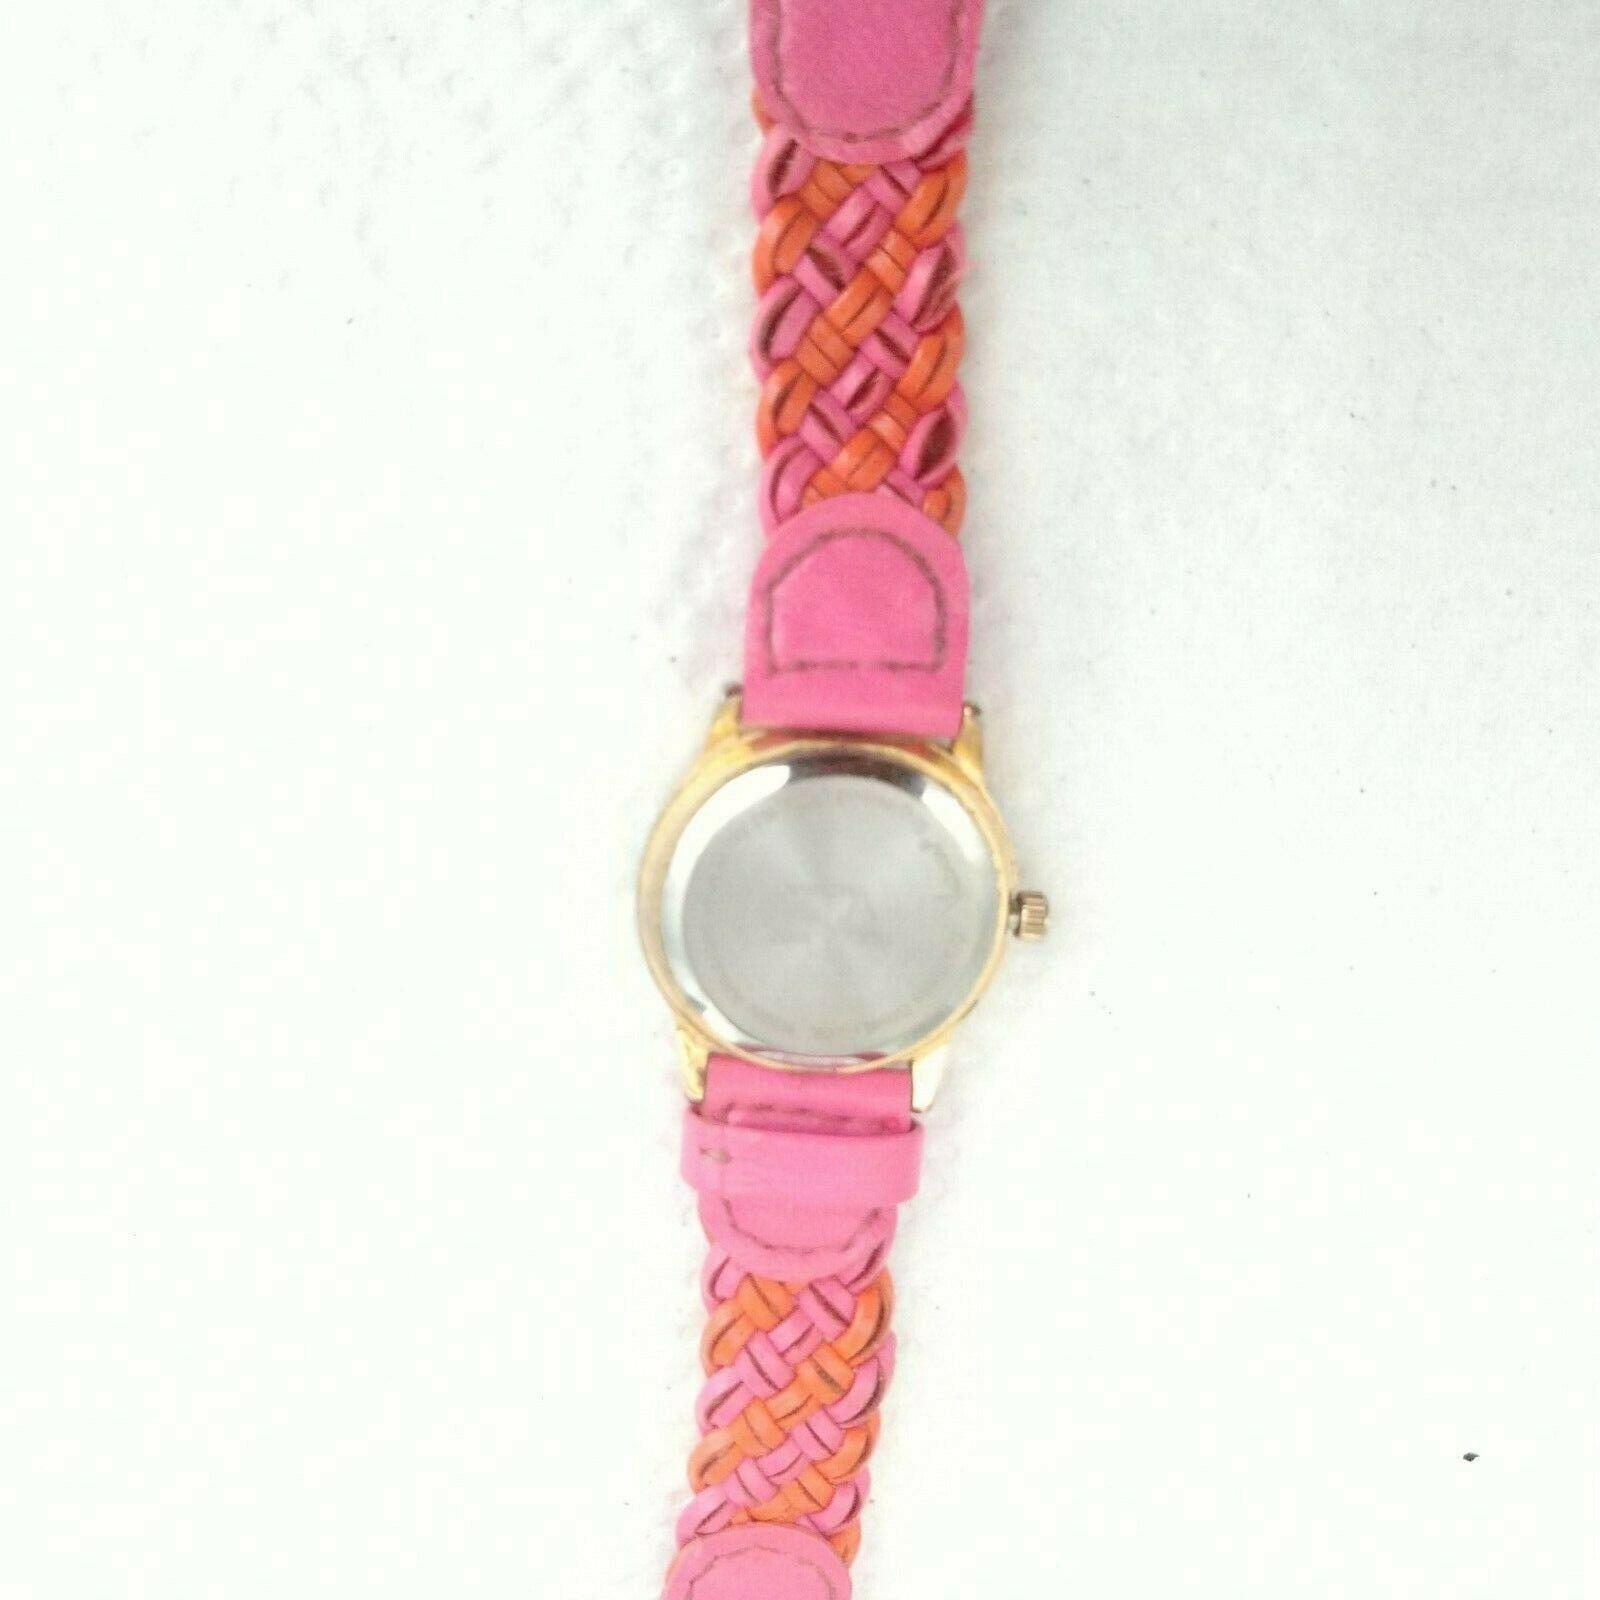 Time4Kidz Watch - Valdawn Vintage Water ressistant  Pink Leather Strap image 8